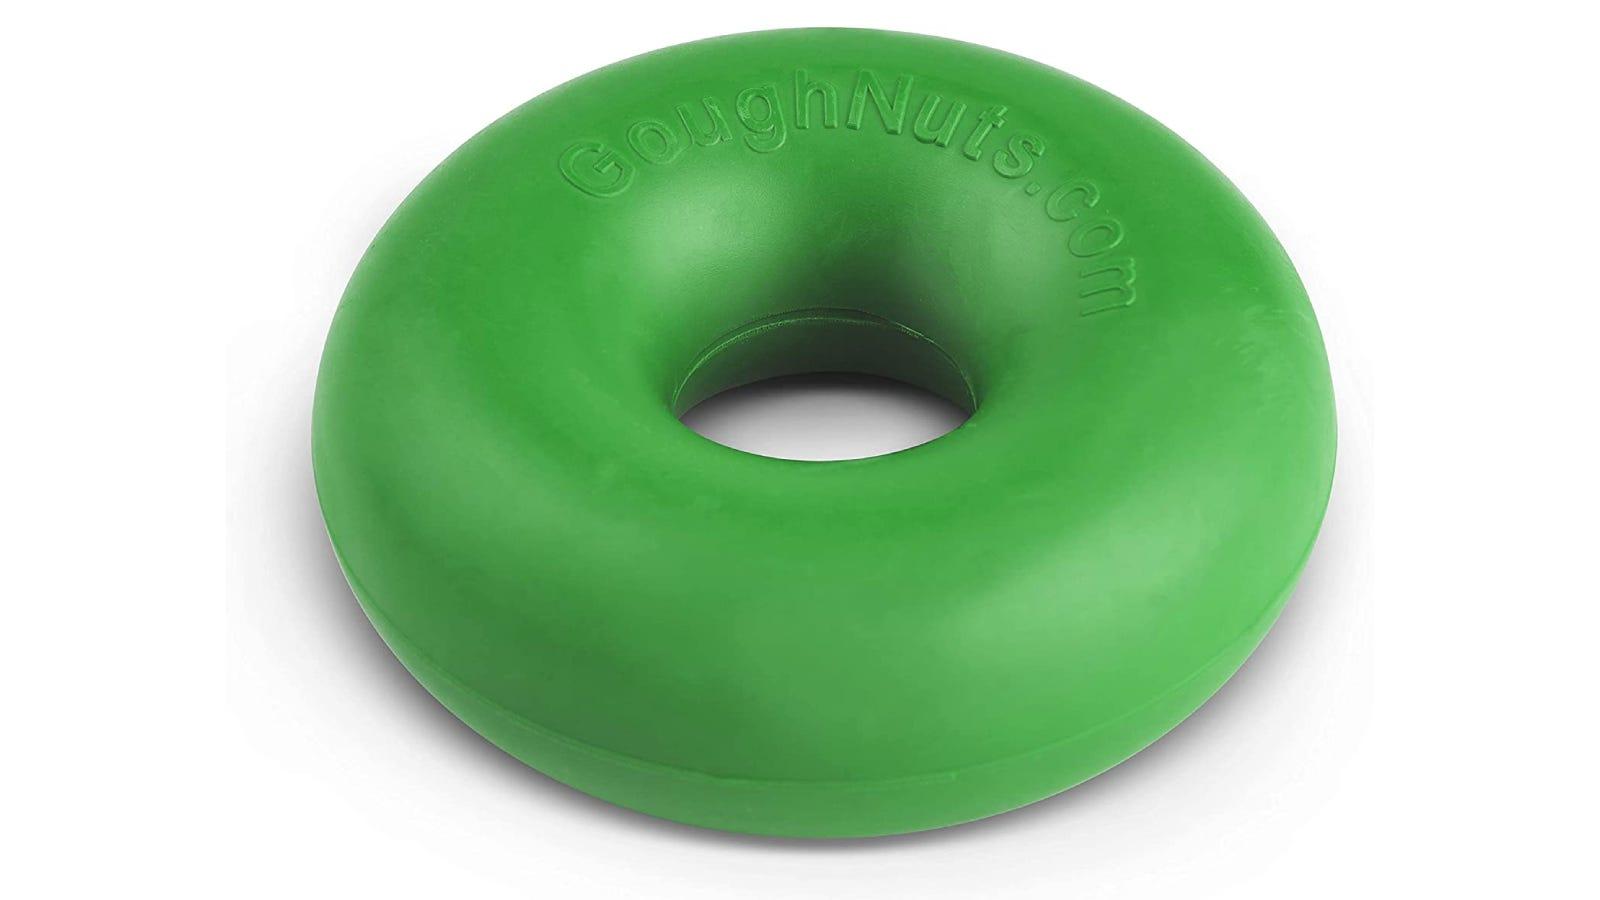 A green chew toy shaped like a doughnut.